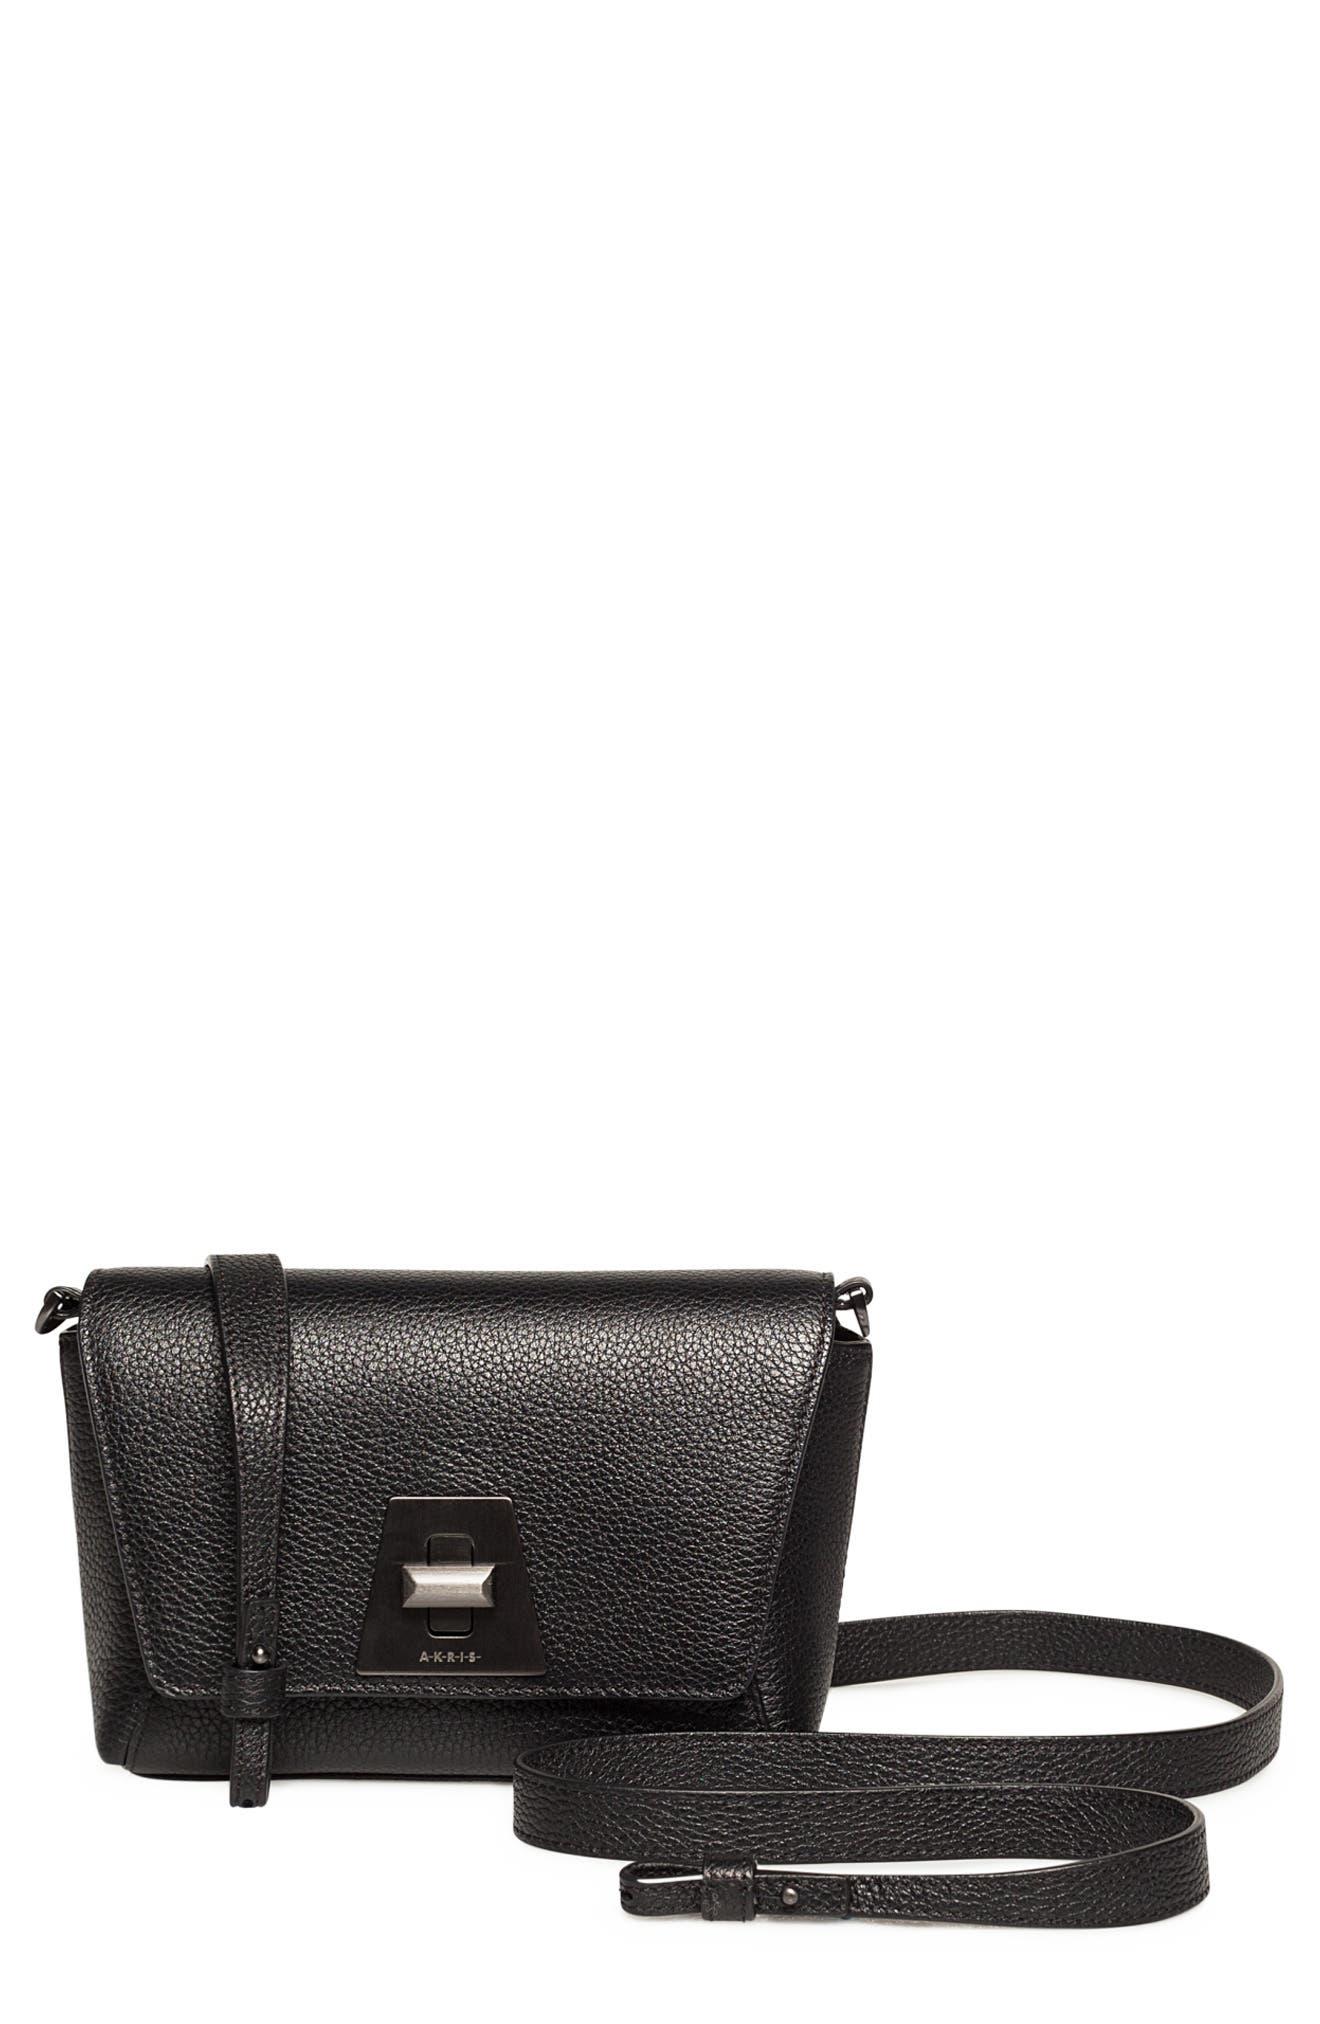 Little Anouk Leather Crossbody Bag,                             Main thumbnail 1, color,                             009 BLACK